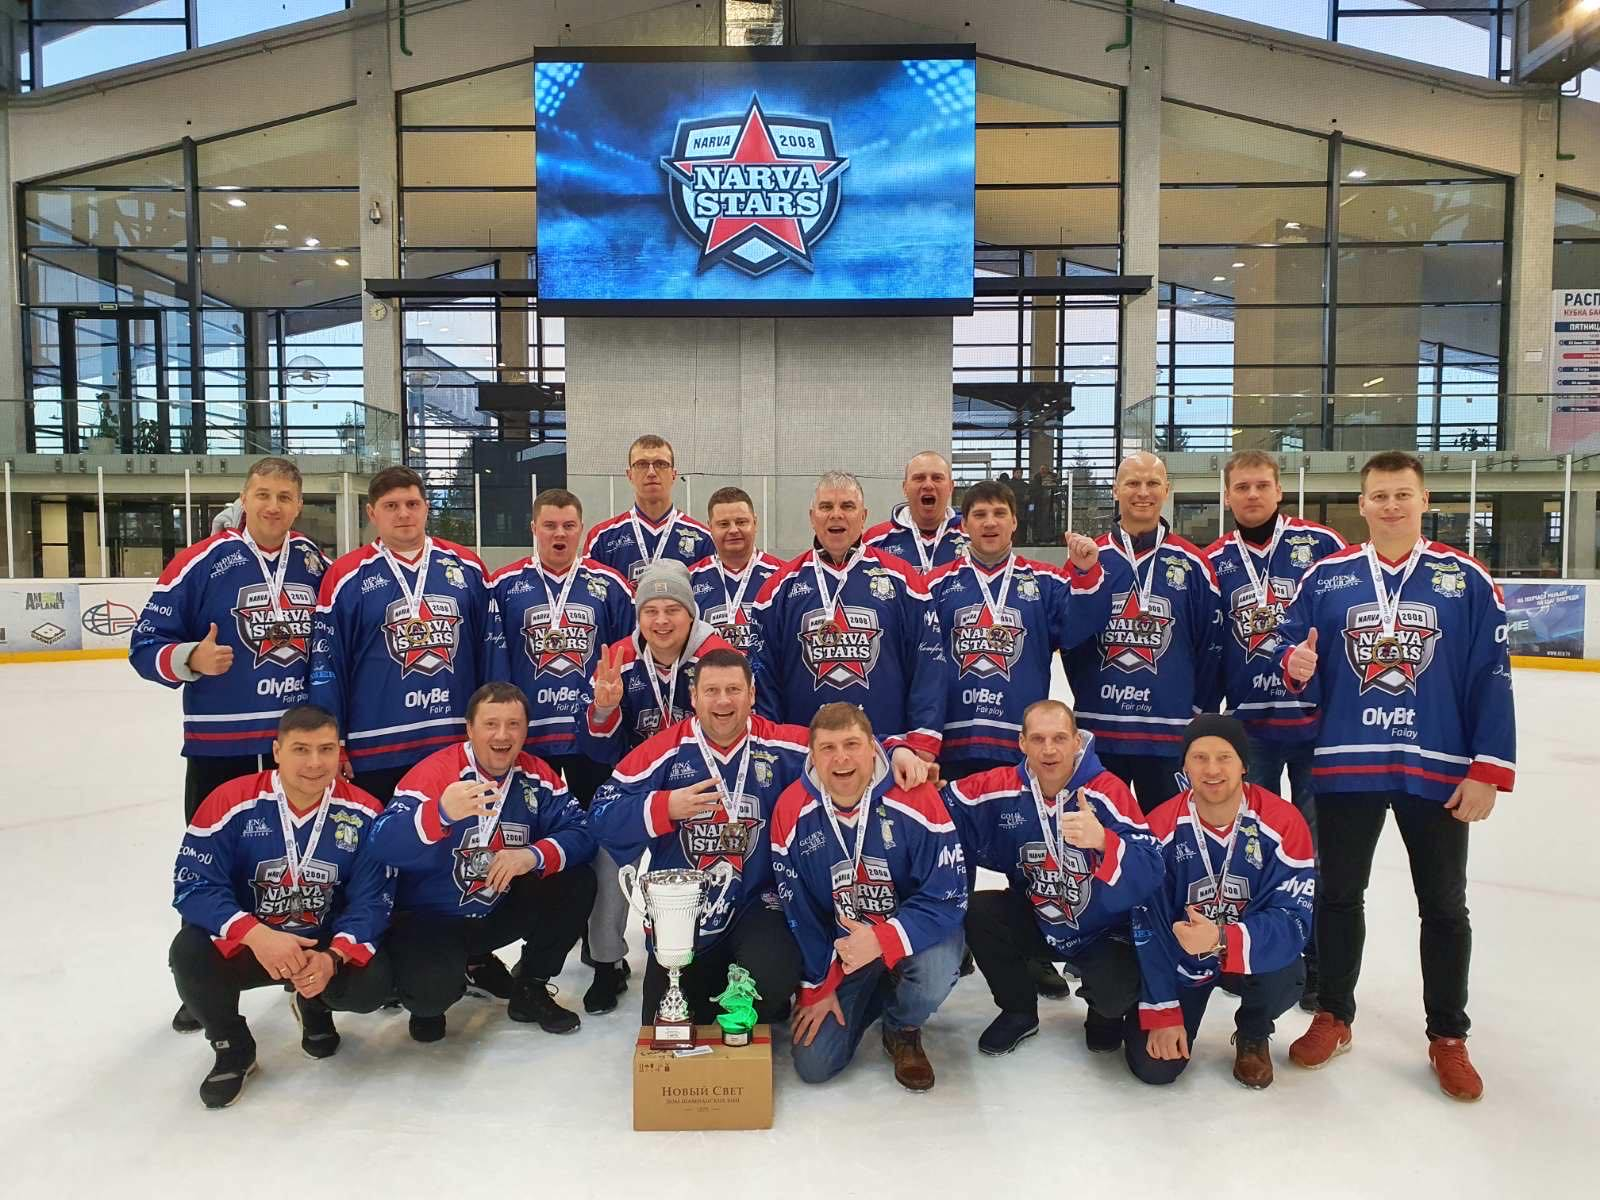 Хоккеисты Narva Stars взяли бронзу на «путинском» льду